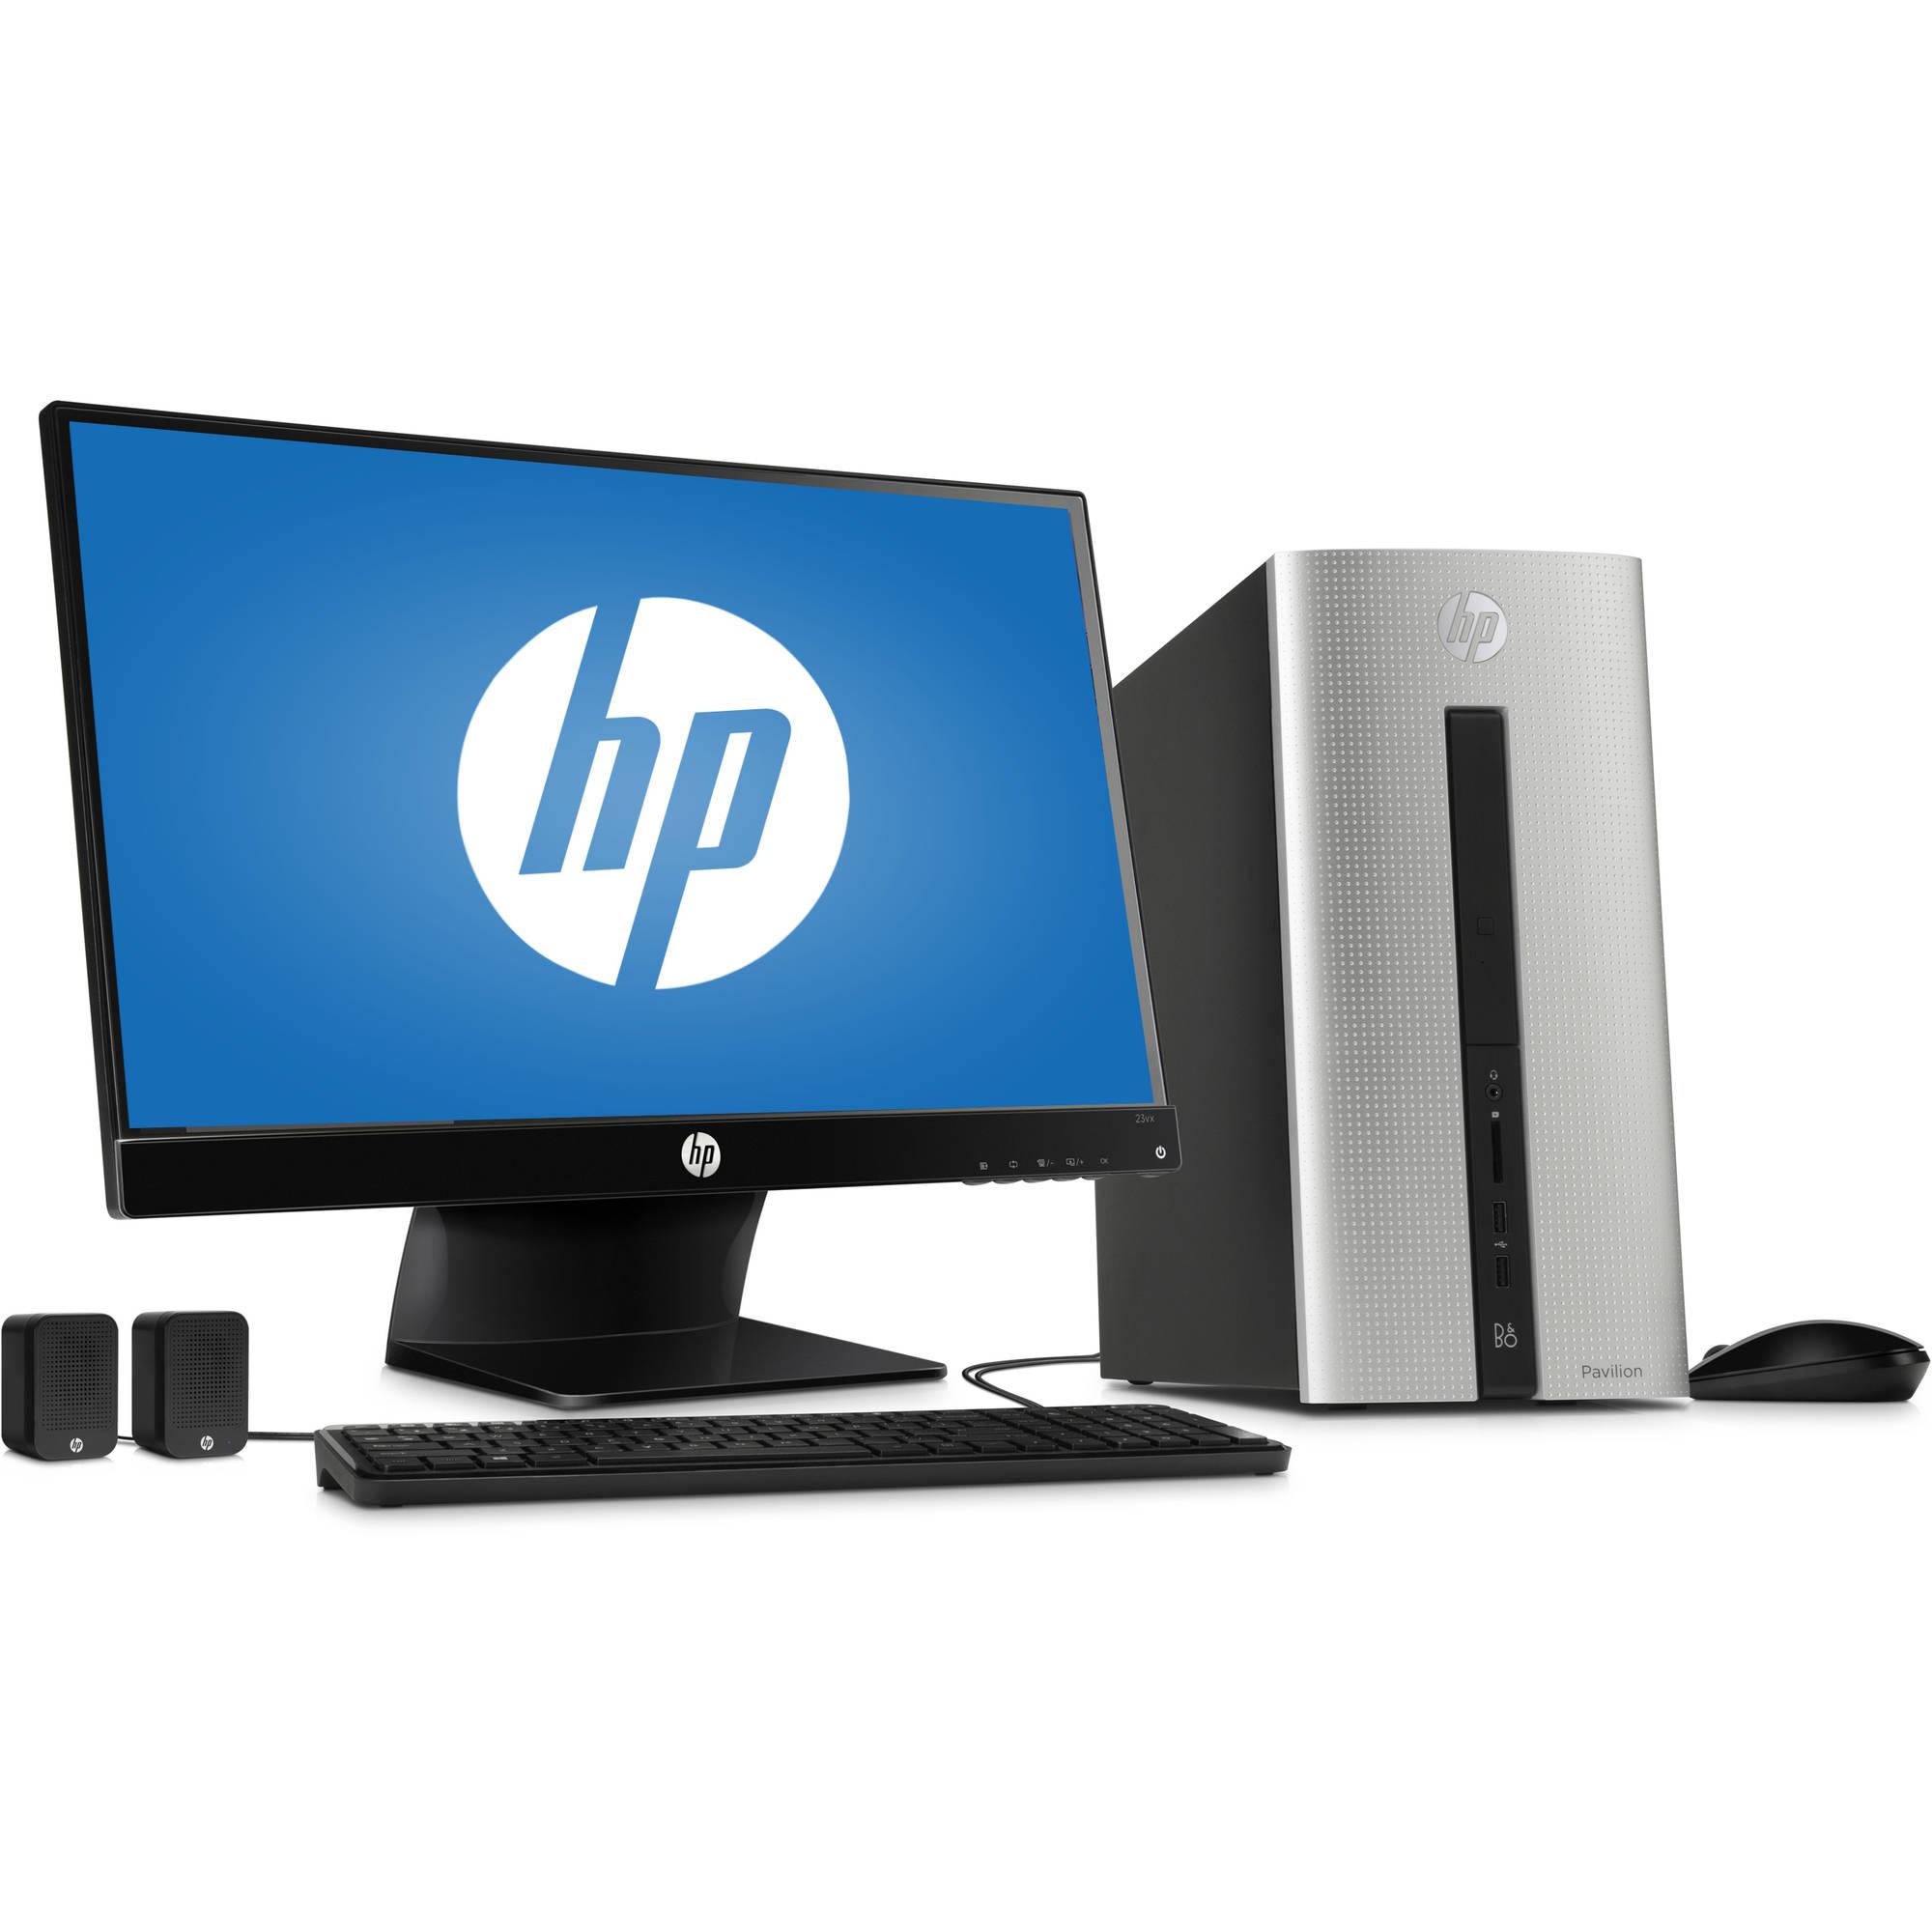 Hp Pavilion 550 153wb Desktop Pc With Intel Core I3 4170 Dual Processor 6gb Memory 23 Monitor 1tb Hard Drive And Windows 10 Home